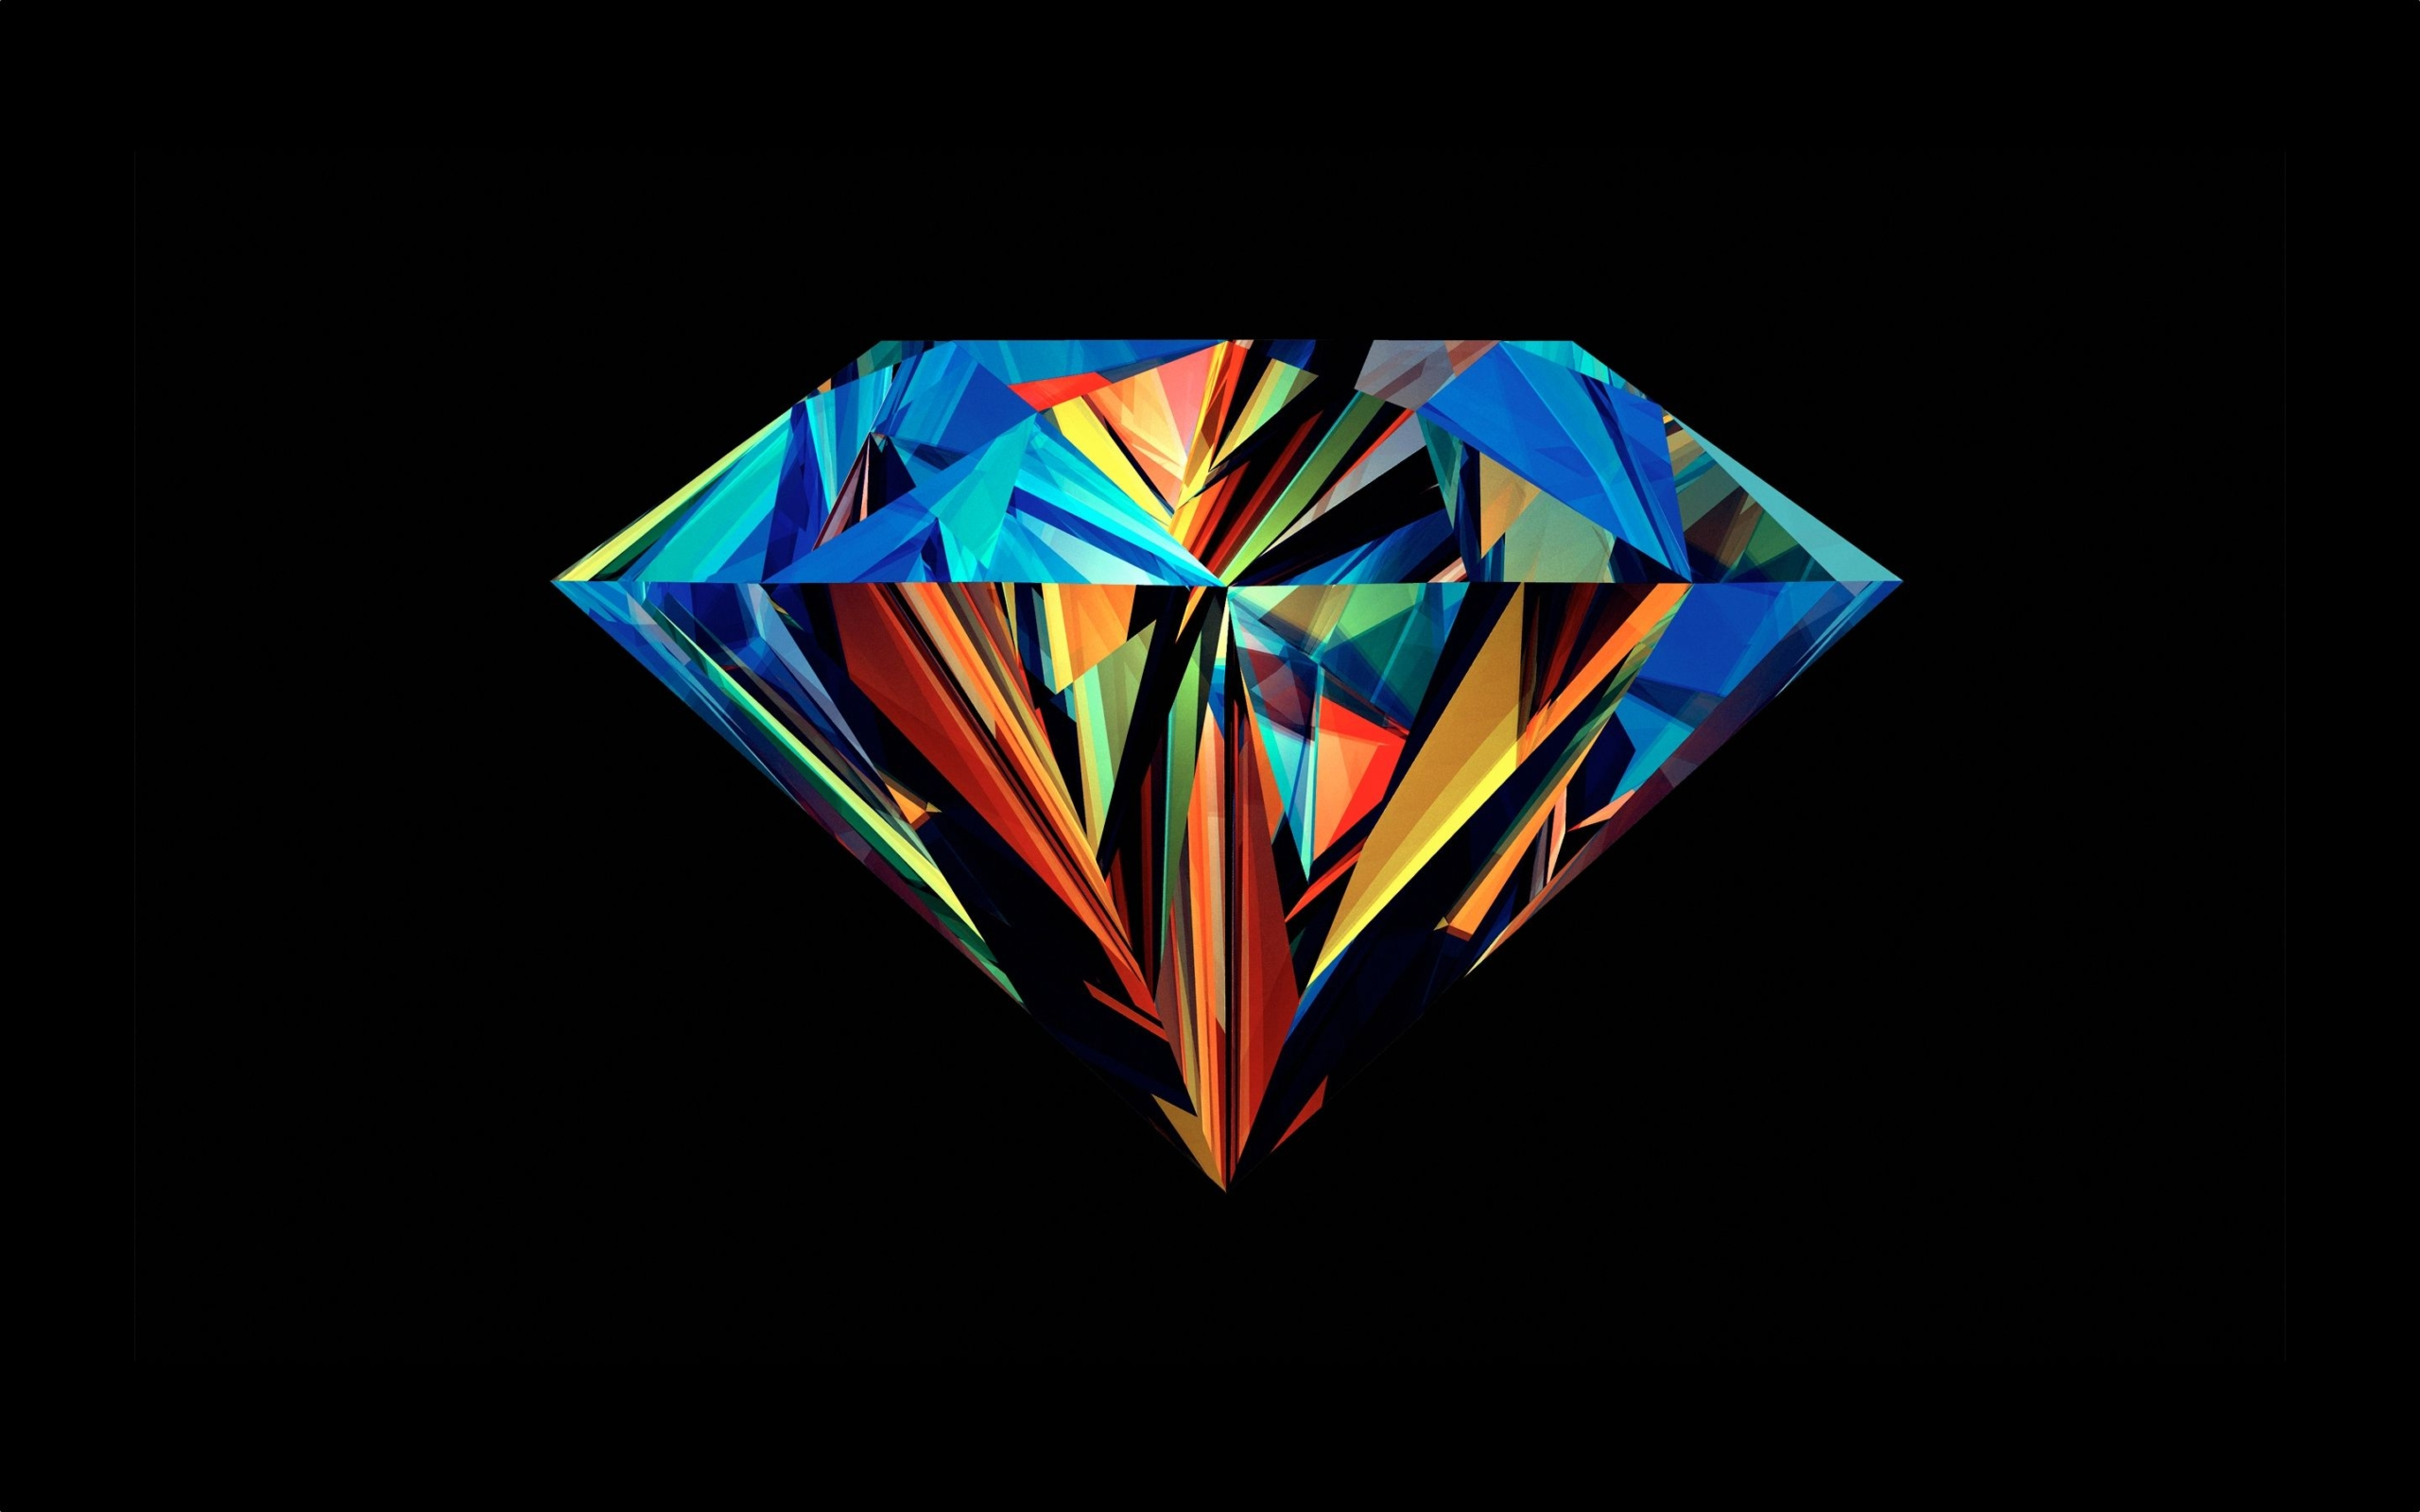 Diamond Wallpaper – Classy, Modern, Yet Simple and Elegant